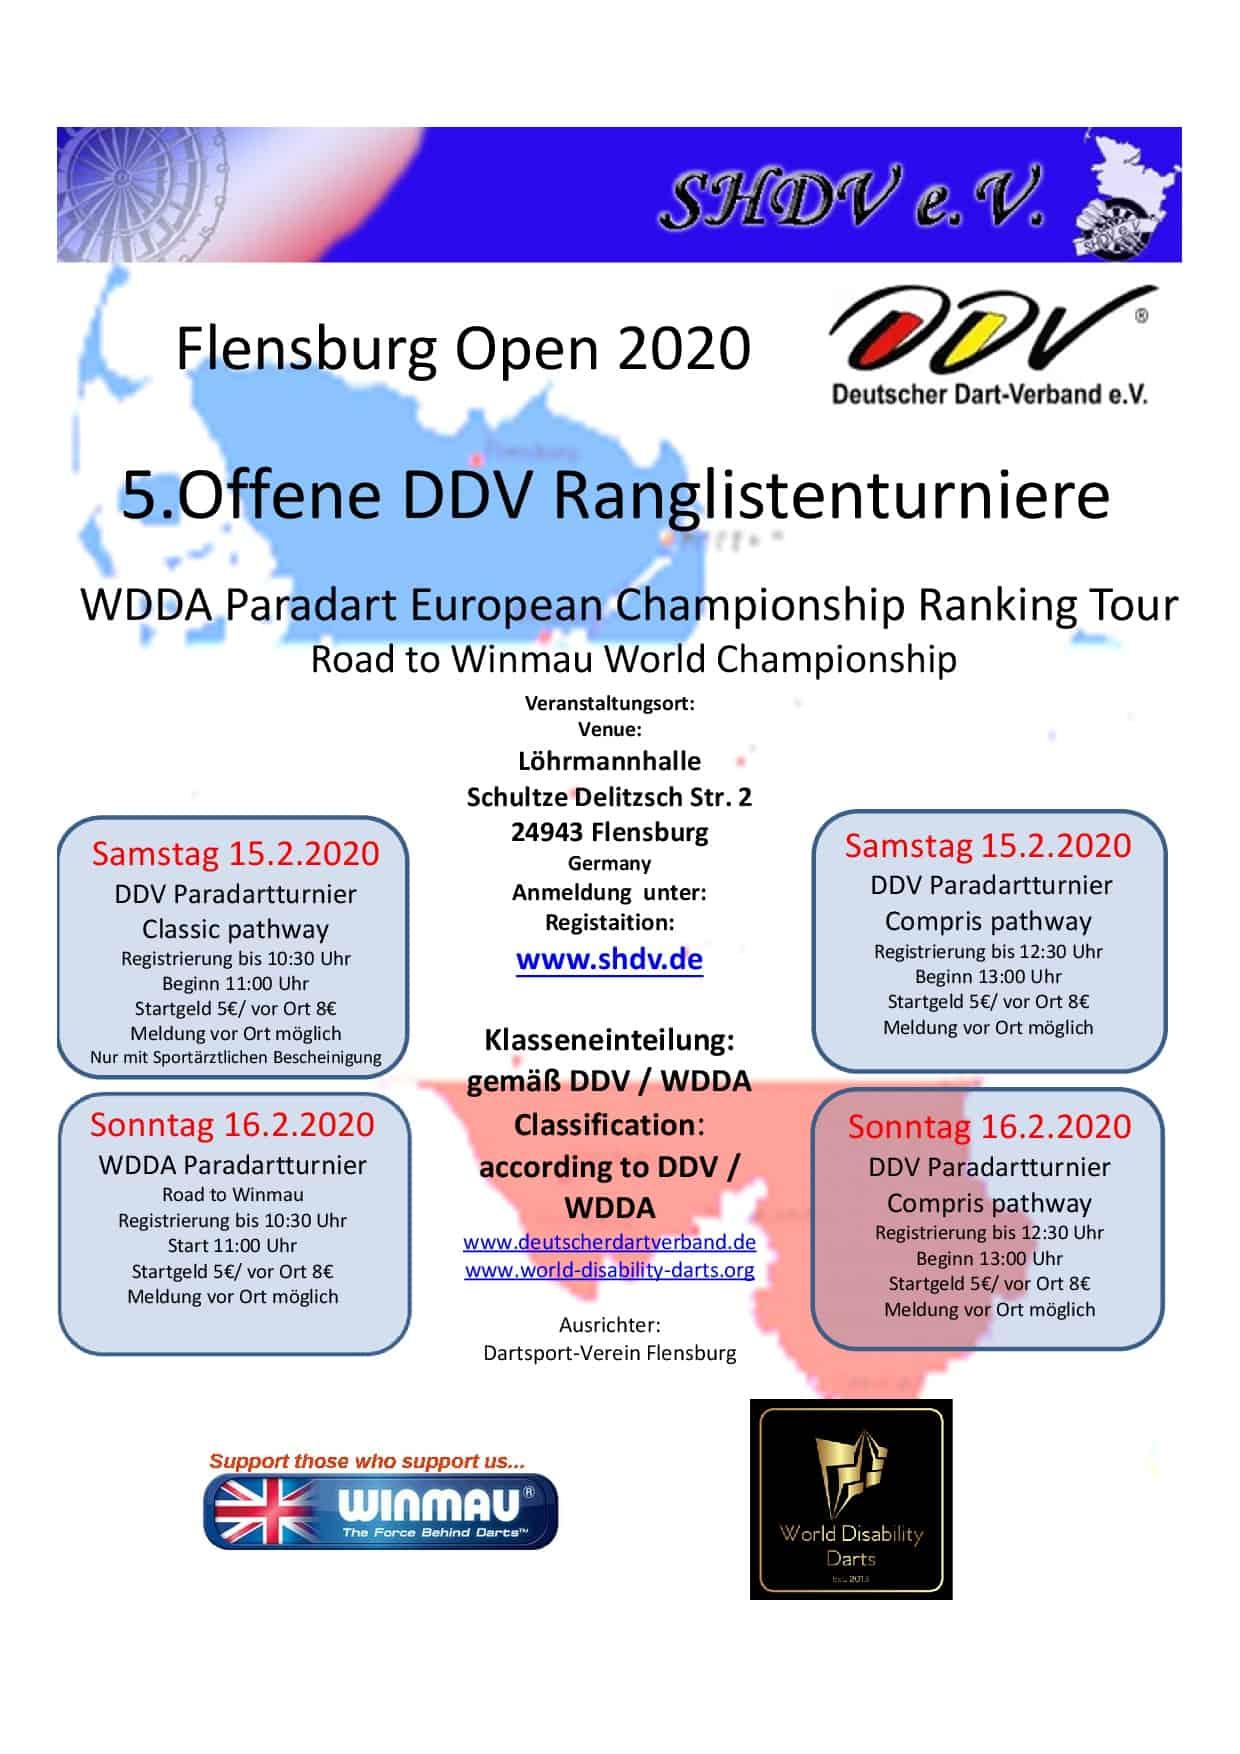 Flensburg Open 2020 Paradart